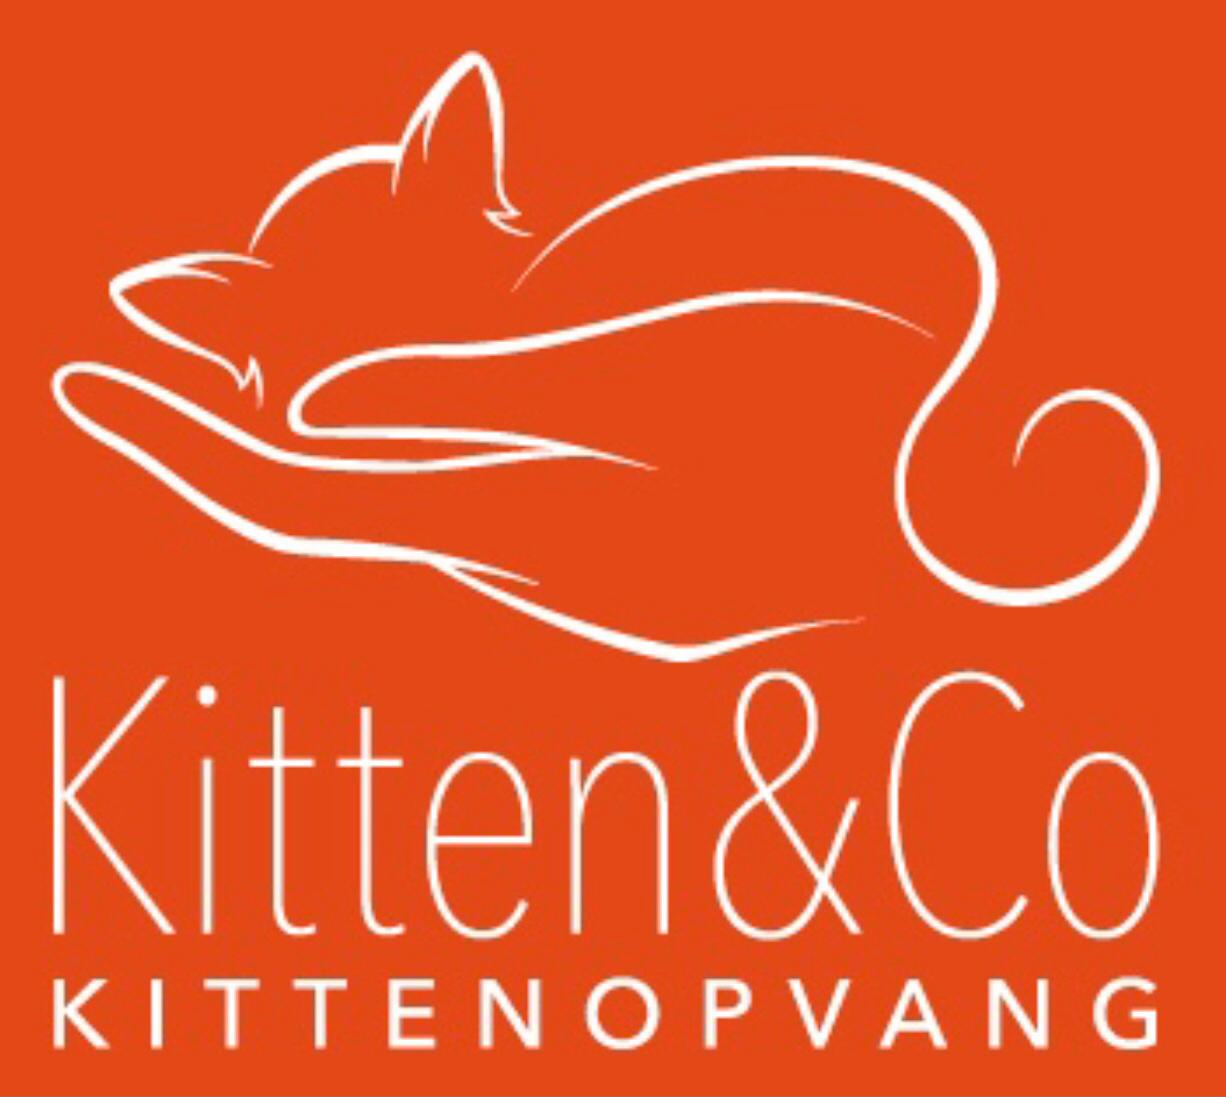 Stichting Kitten & Co